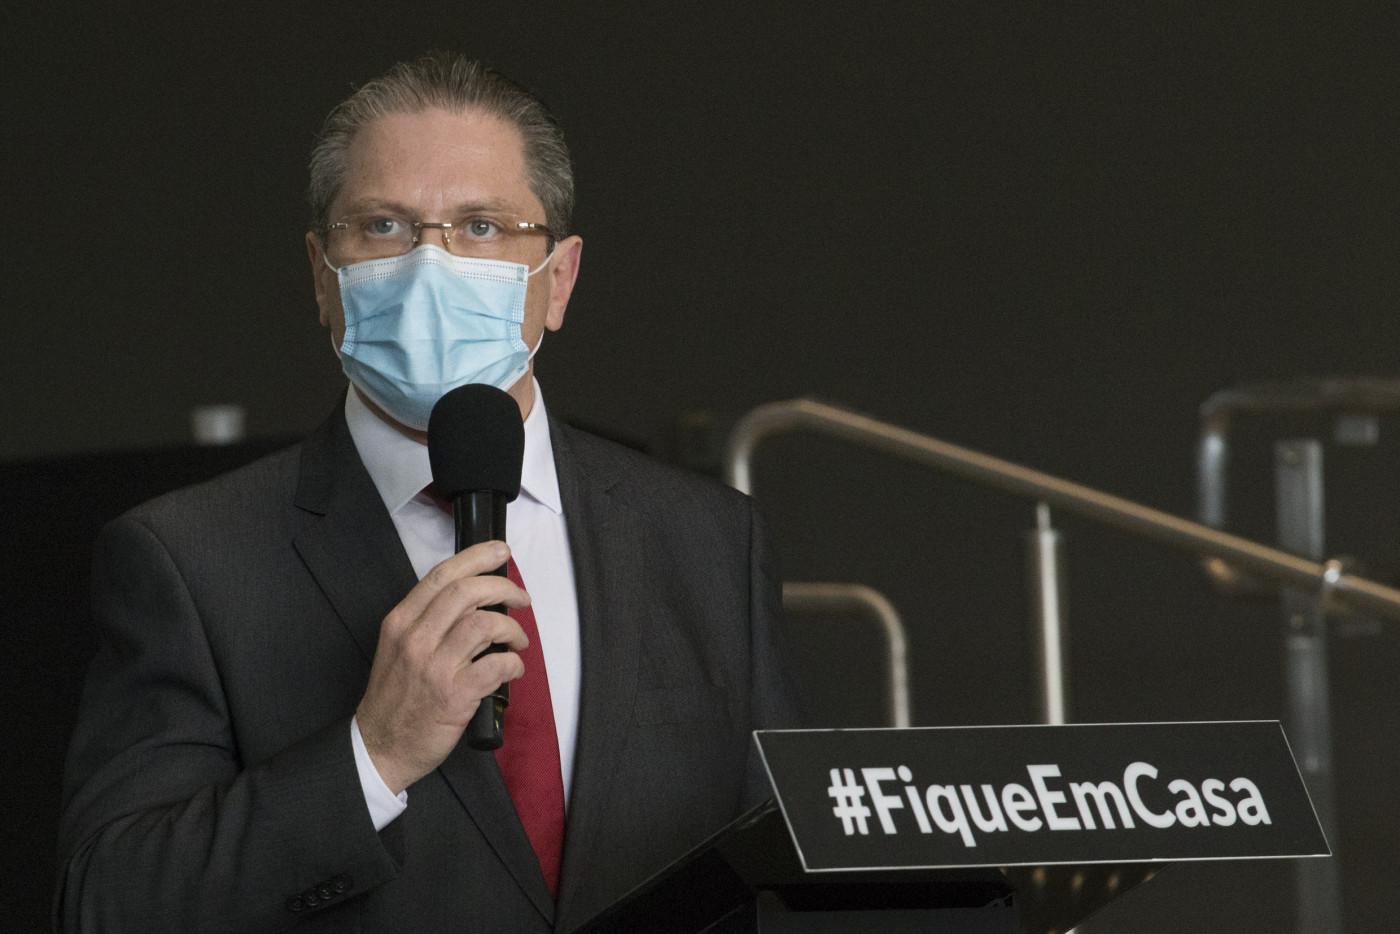 O secretário de Saúde, Jean Gorinchteyn, falando ao microfone durante coletiva de imprensa